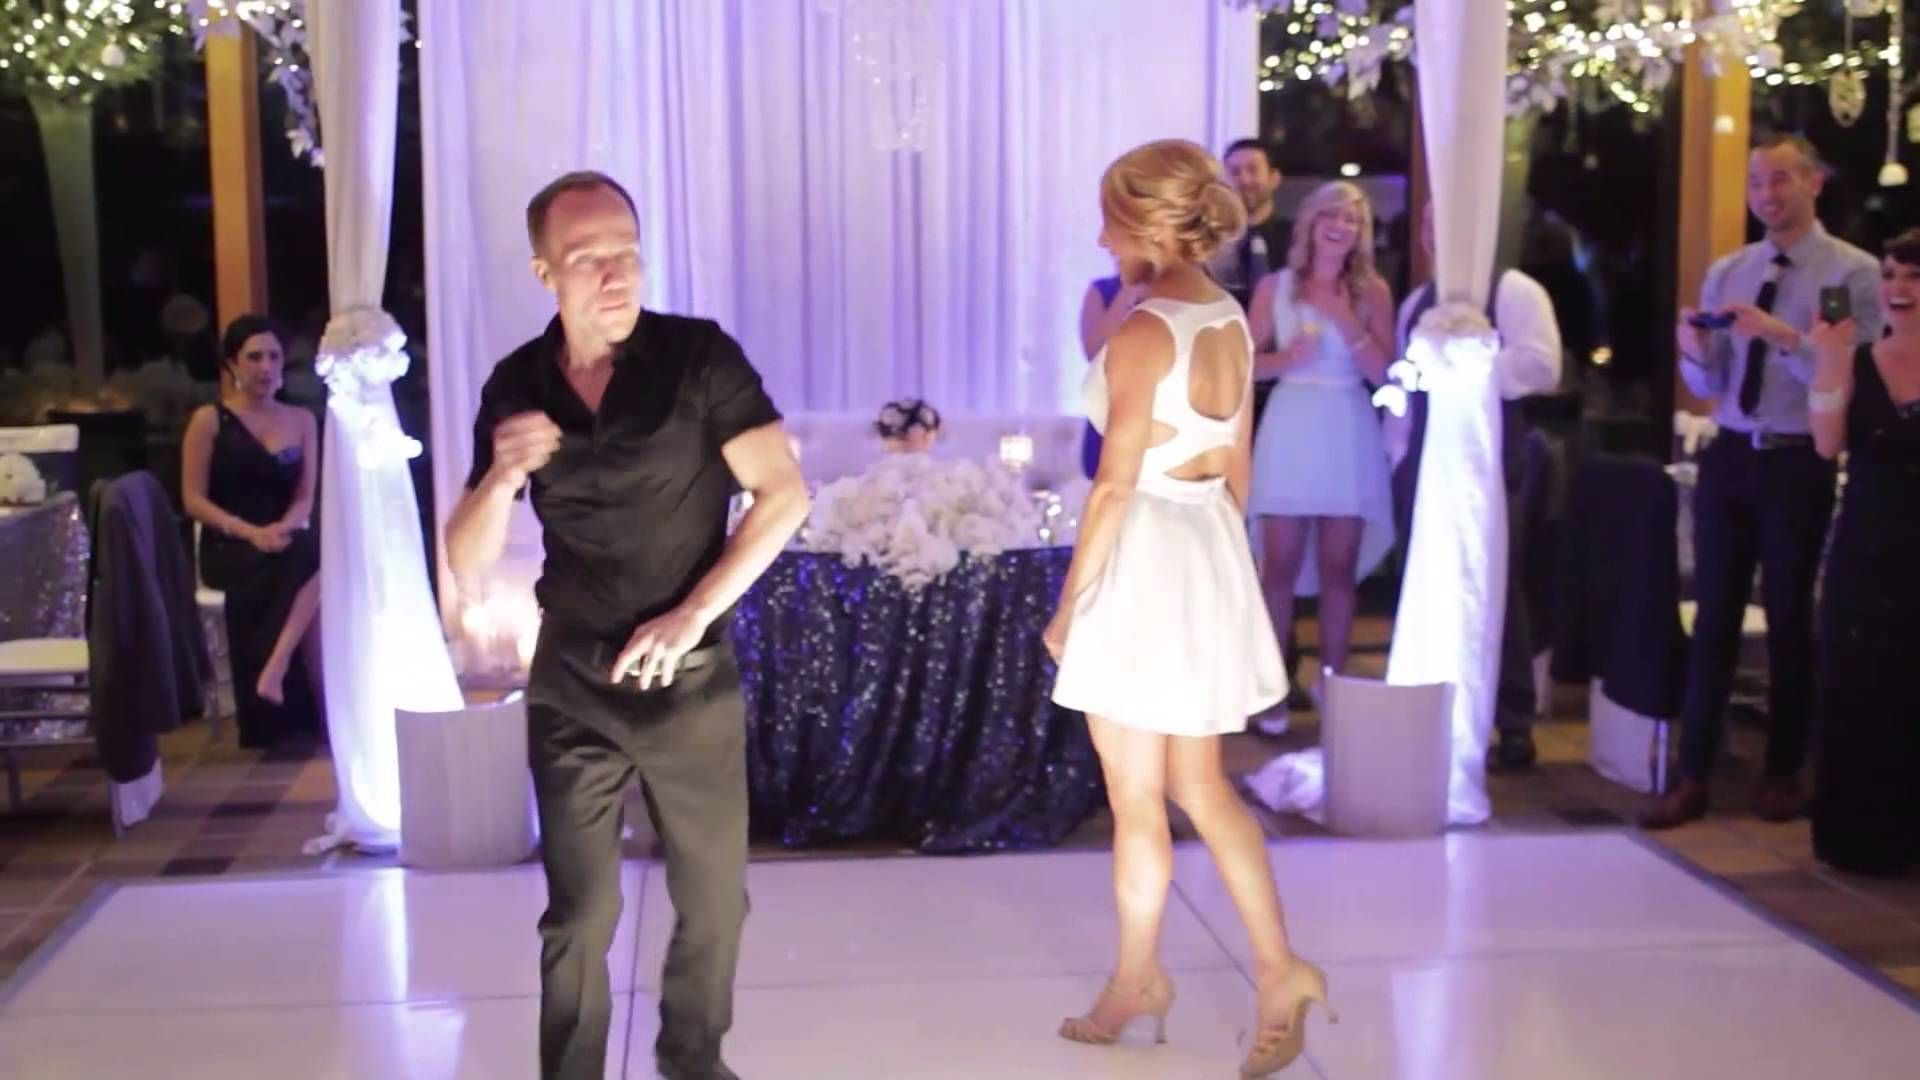 Dirty Dancing Time Of My Life Wedding Dance W Lift Black Eyed Peas Di